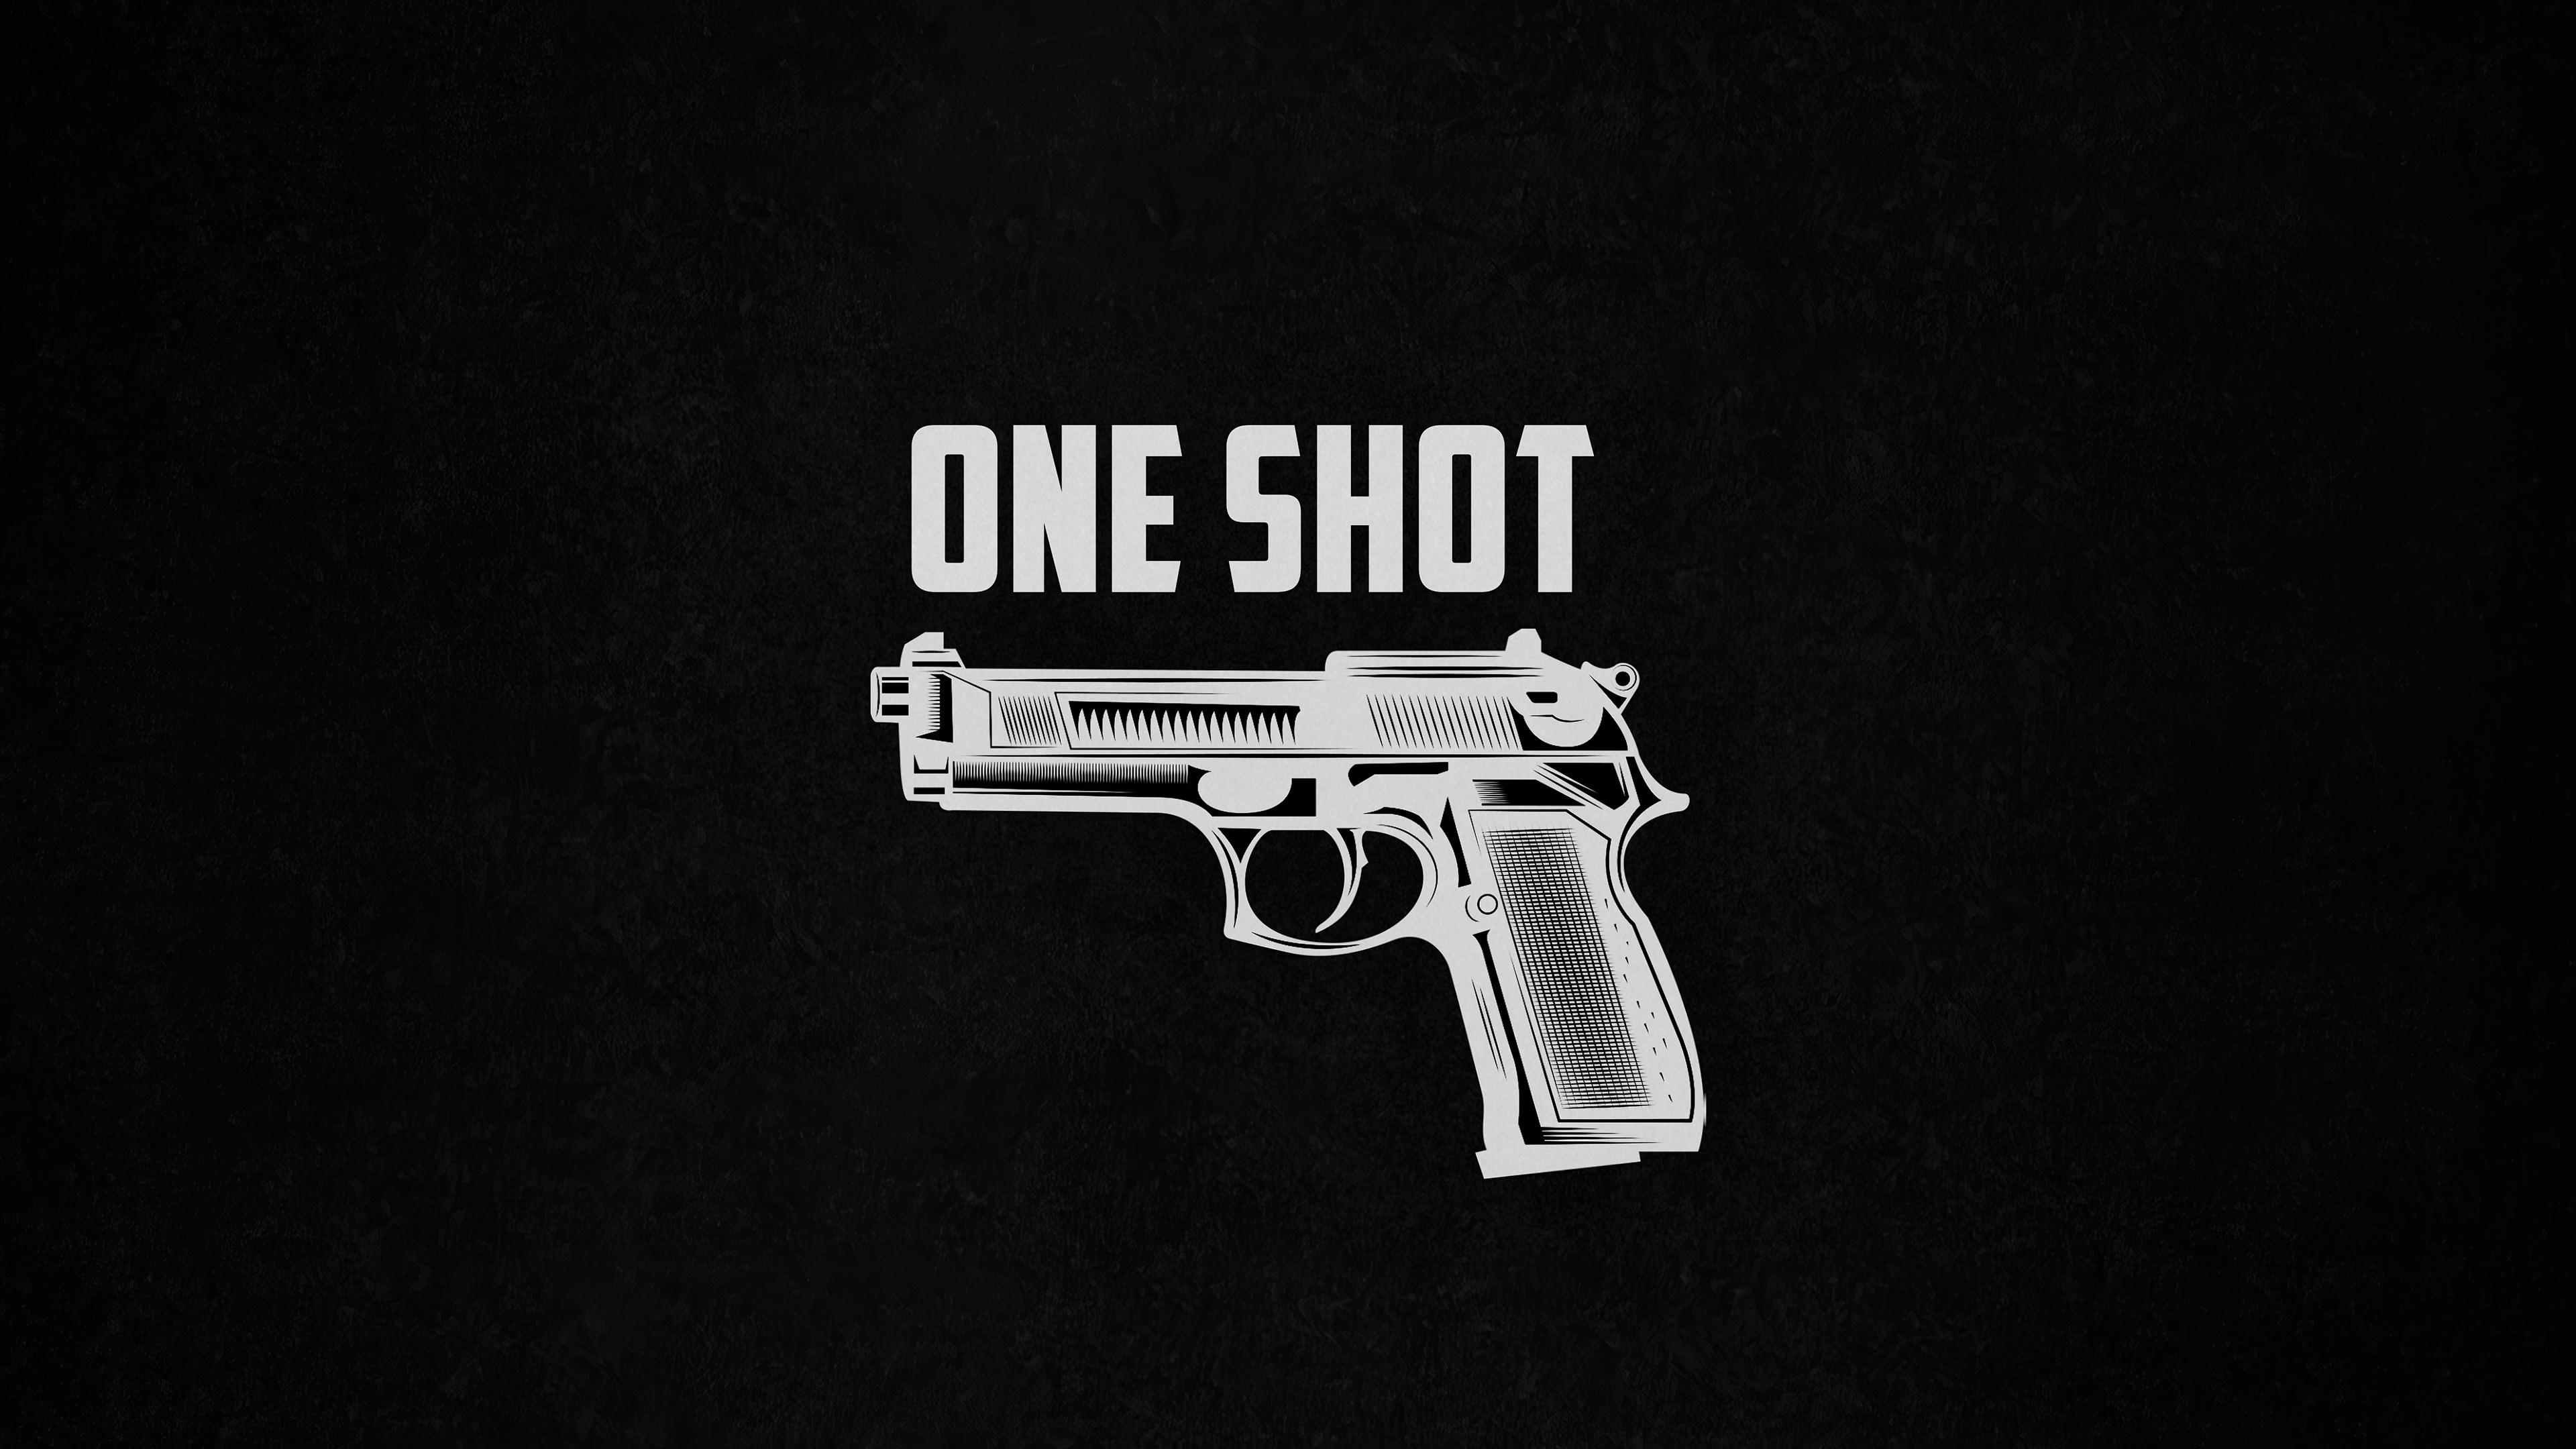 gun one shot dark 4k 1608659078 - Gun One Shot Dark 4k - Gun One Shot Dark 4k wallpapers